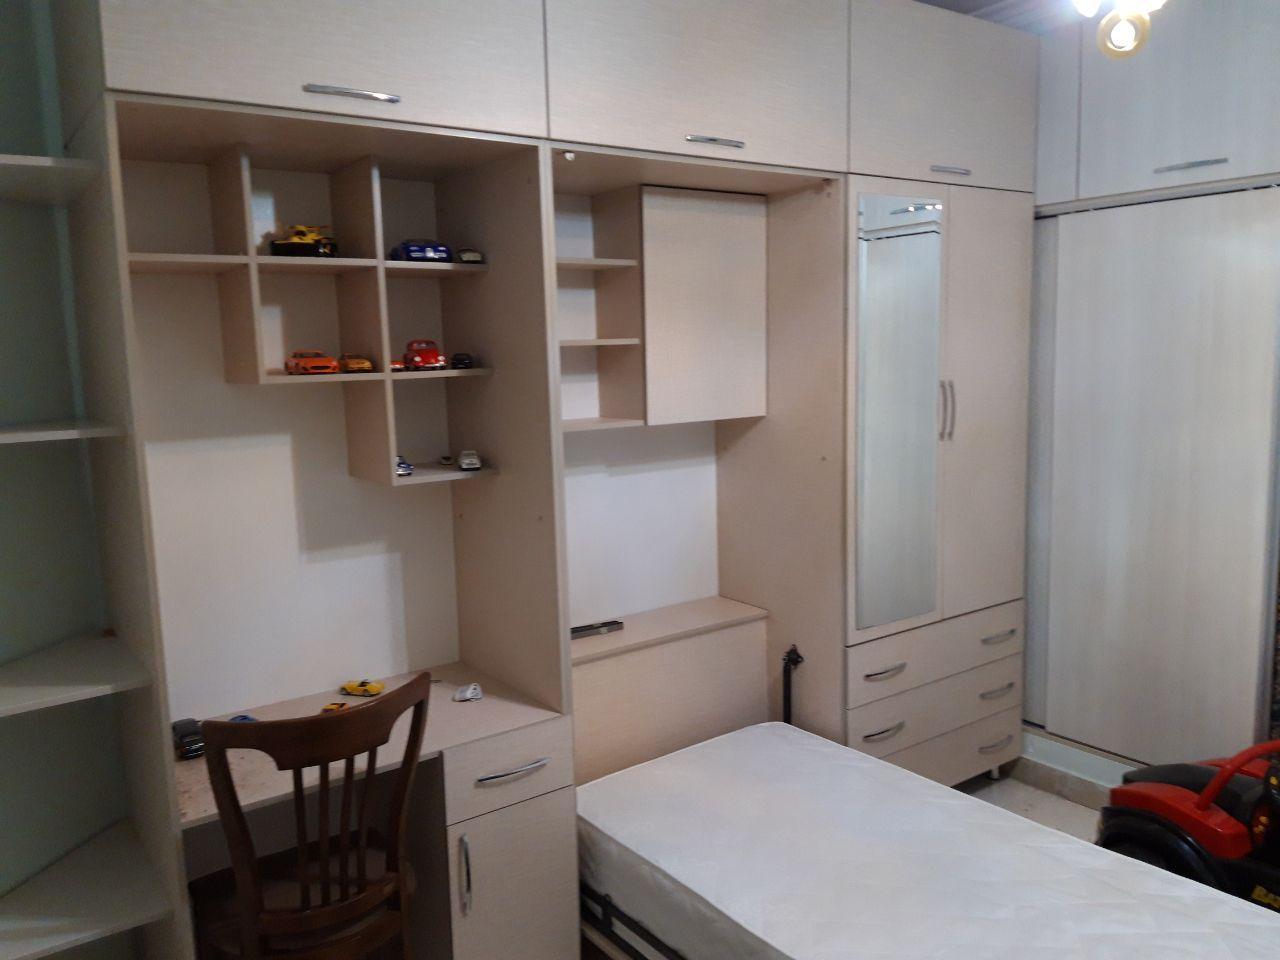 تخت کمجا /کابینت/سرویس خواب کودک/کمد دیواری/انواع میز /سرویس خواب بزرگسال